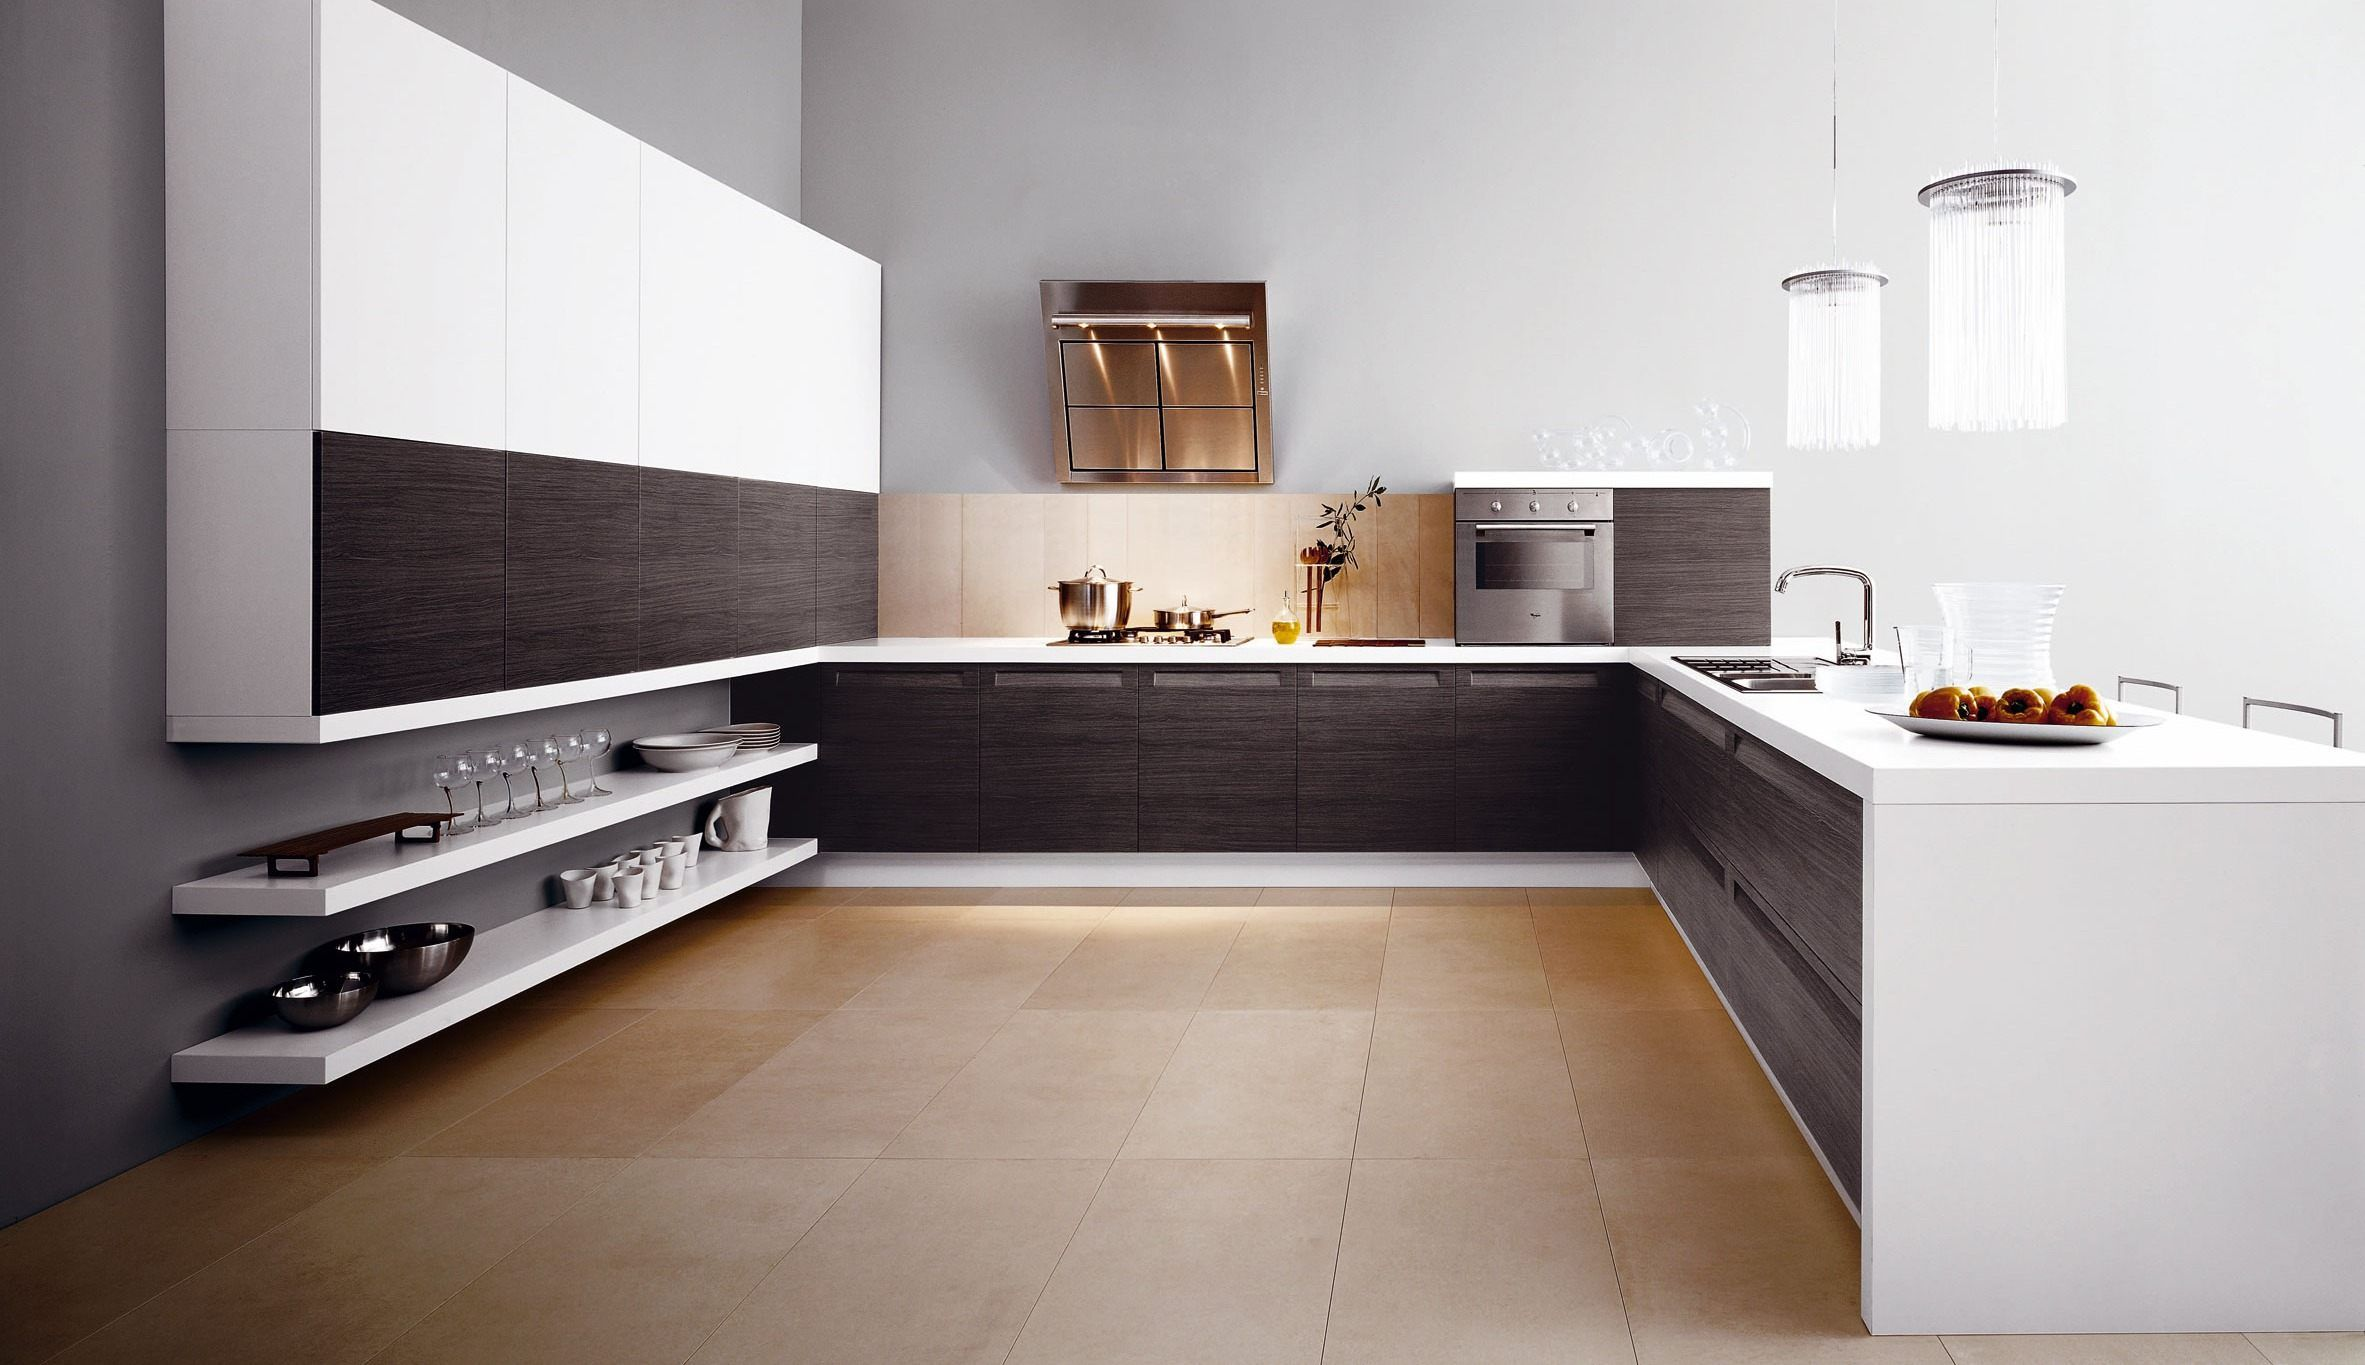 Classic Italian Design Kitchen Appliances Creative Lighting For Best Italian Design Kitchen Inspiration